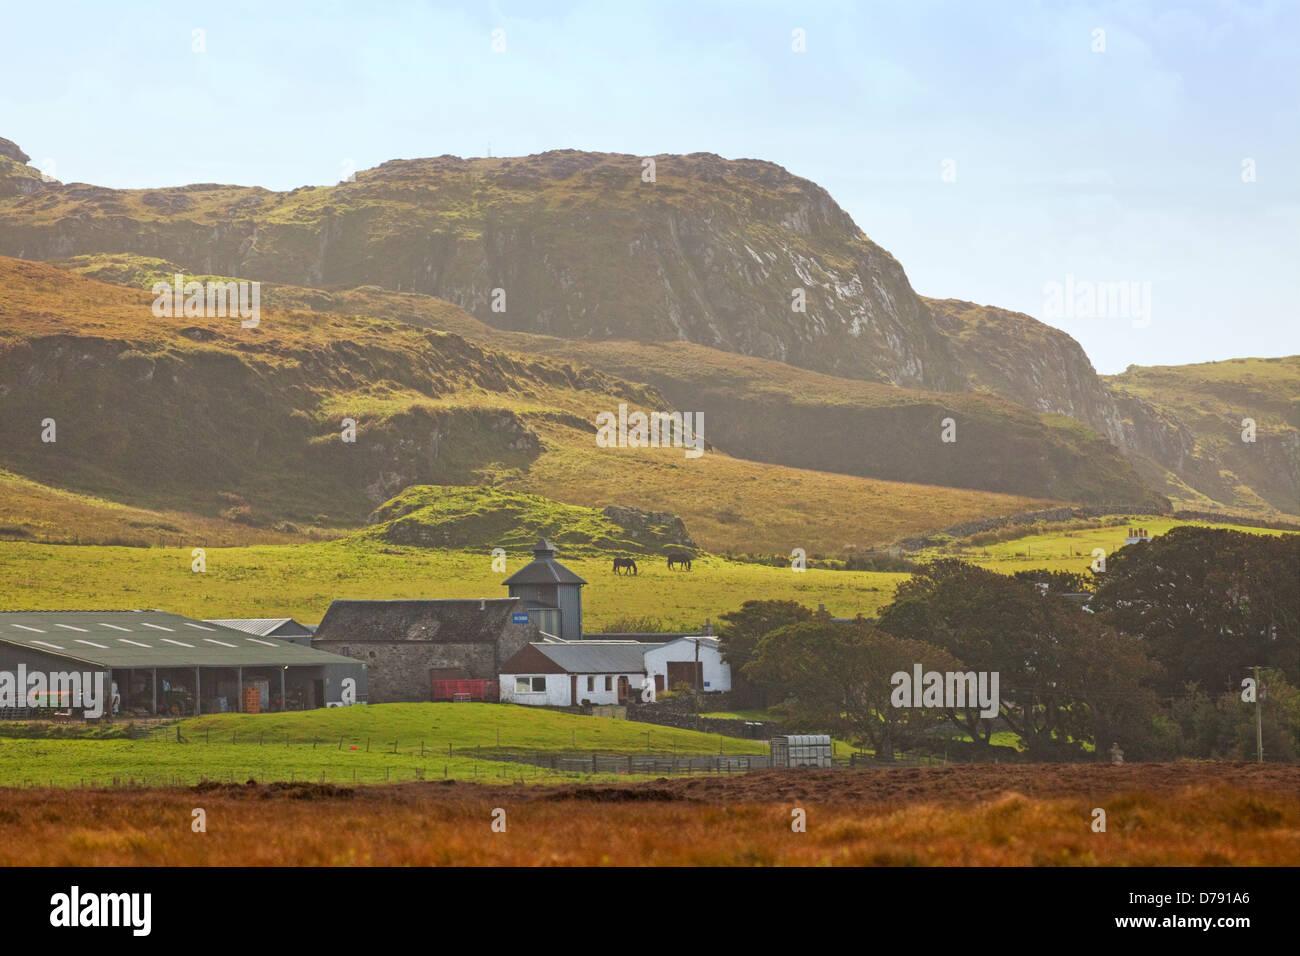 Kilchoman Distillery on the Isle of Islay - Stock Image